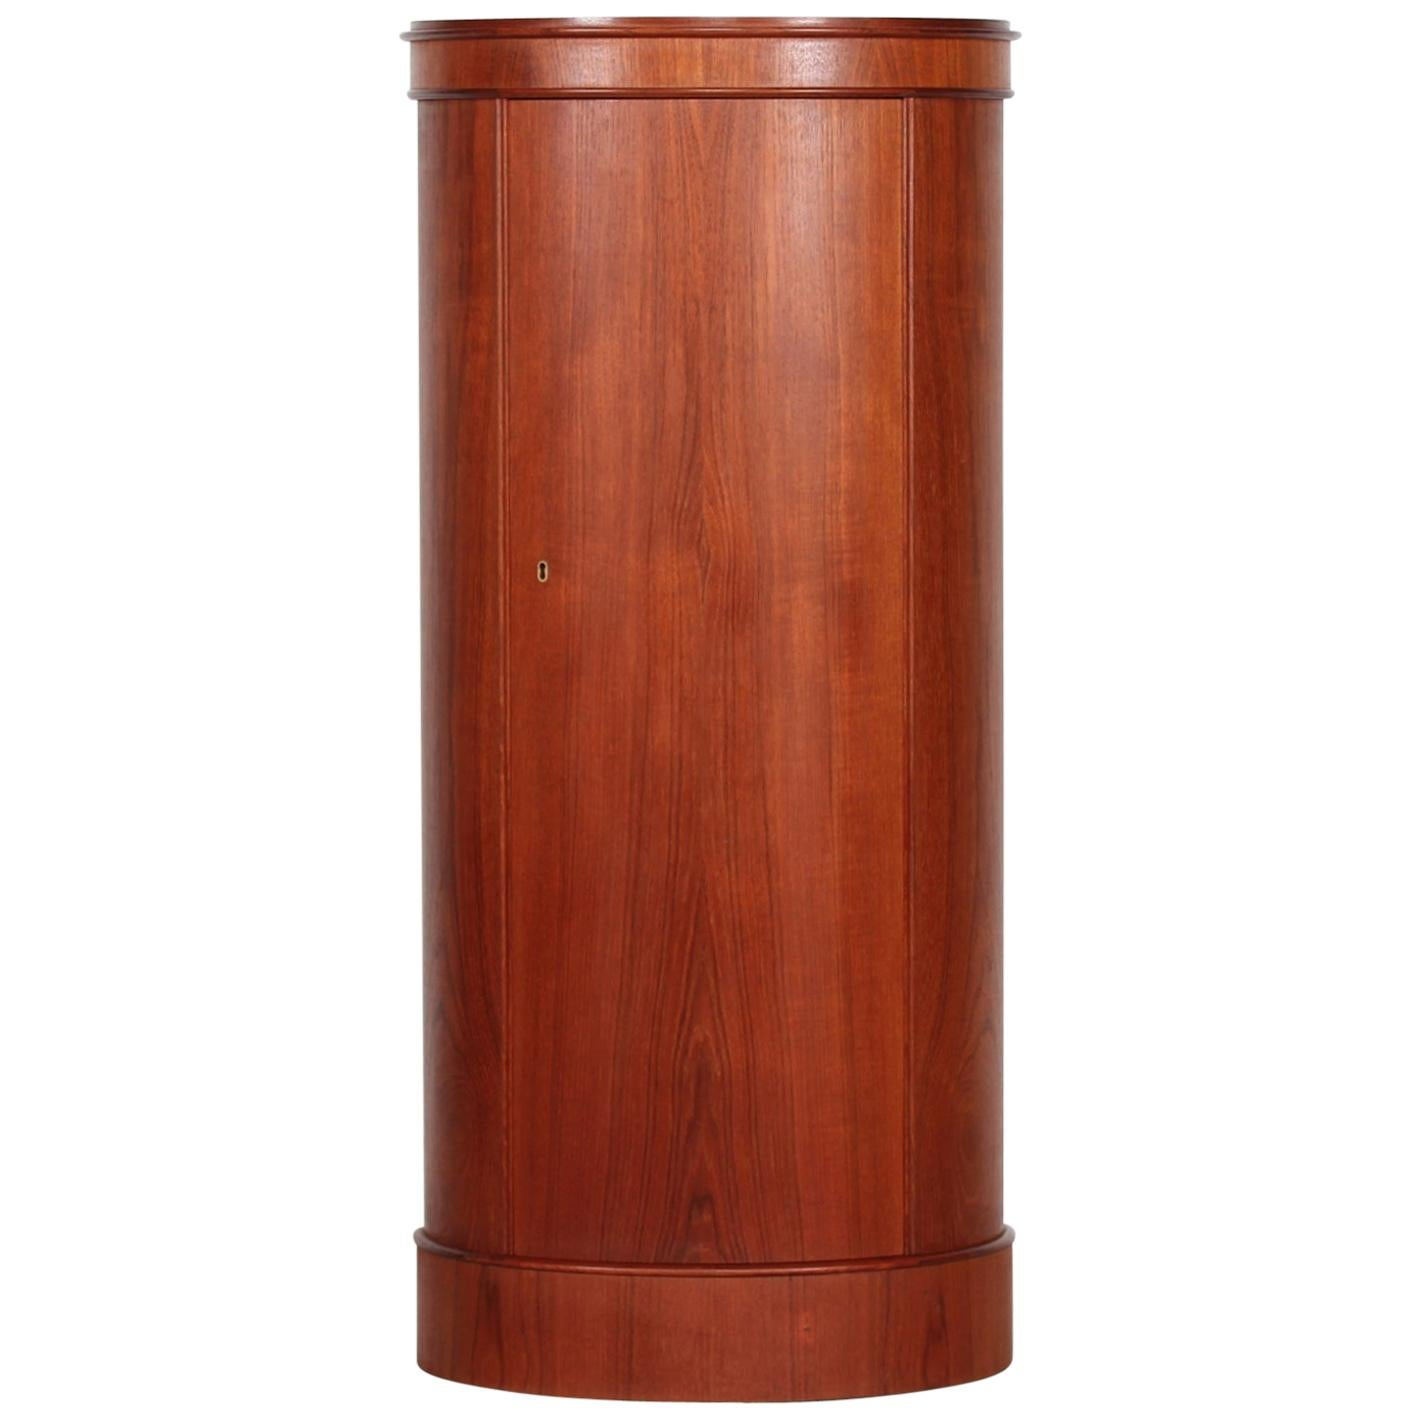 Johannes Sorth Danish Modern Oval Pedestal Cupboard made of Teak, Denmark, 1960s